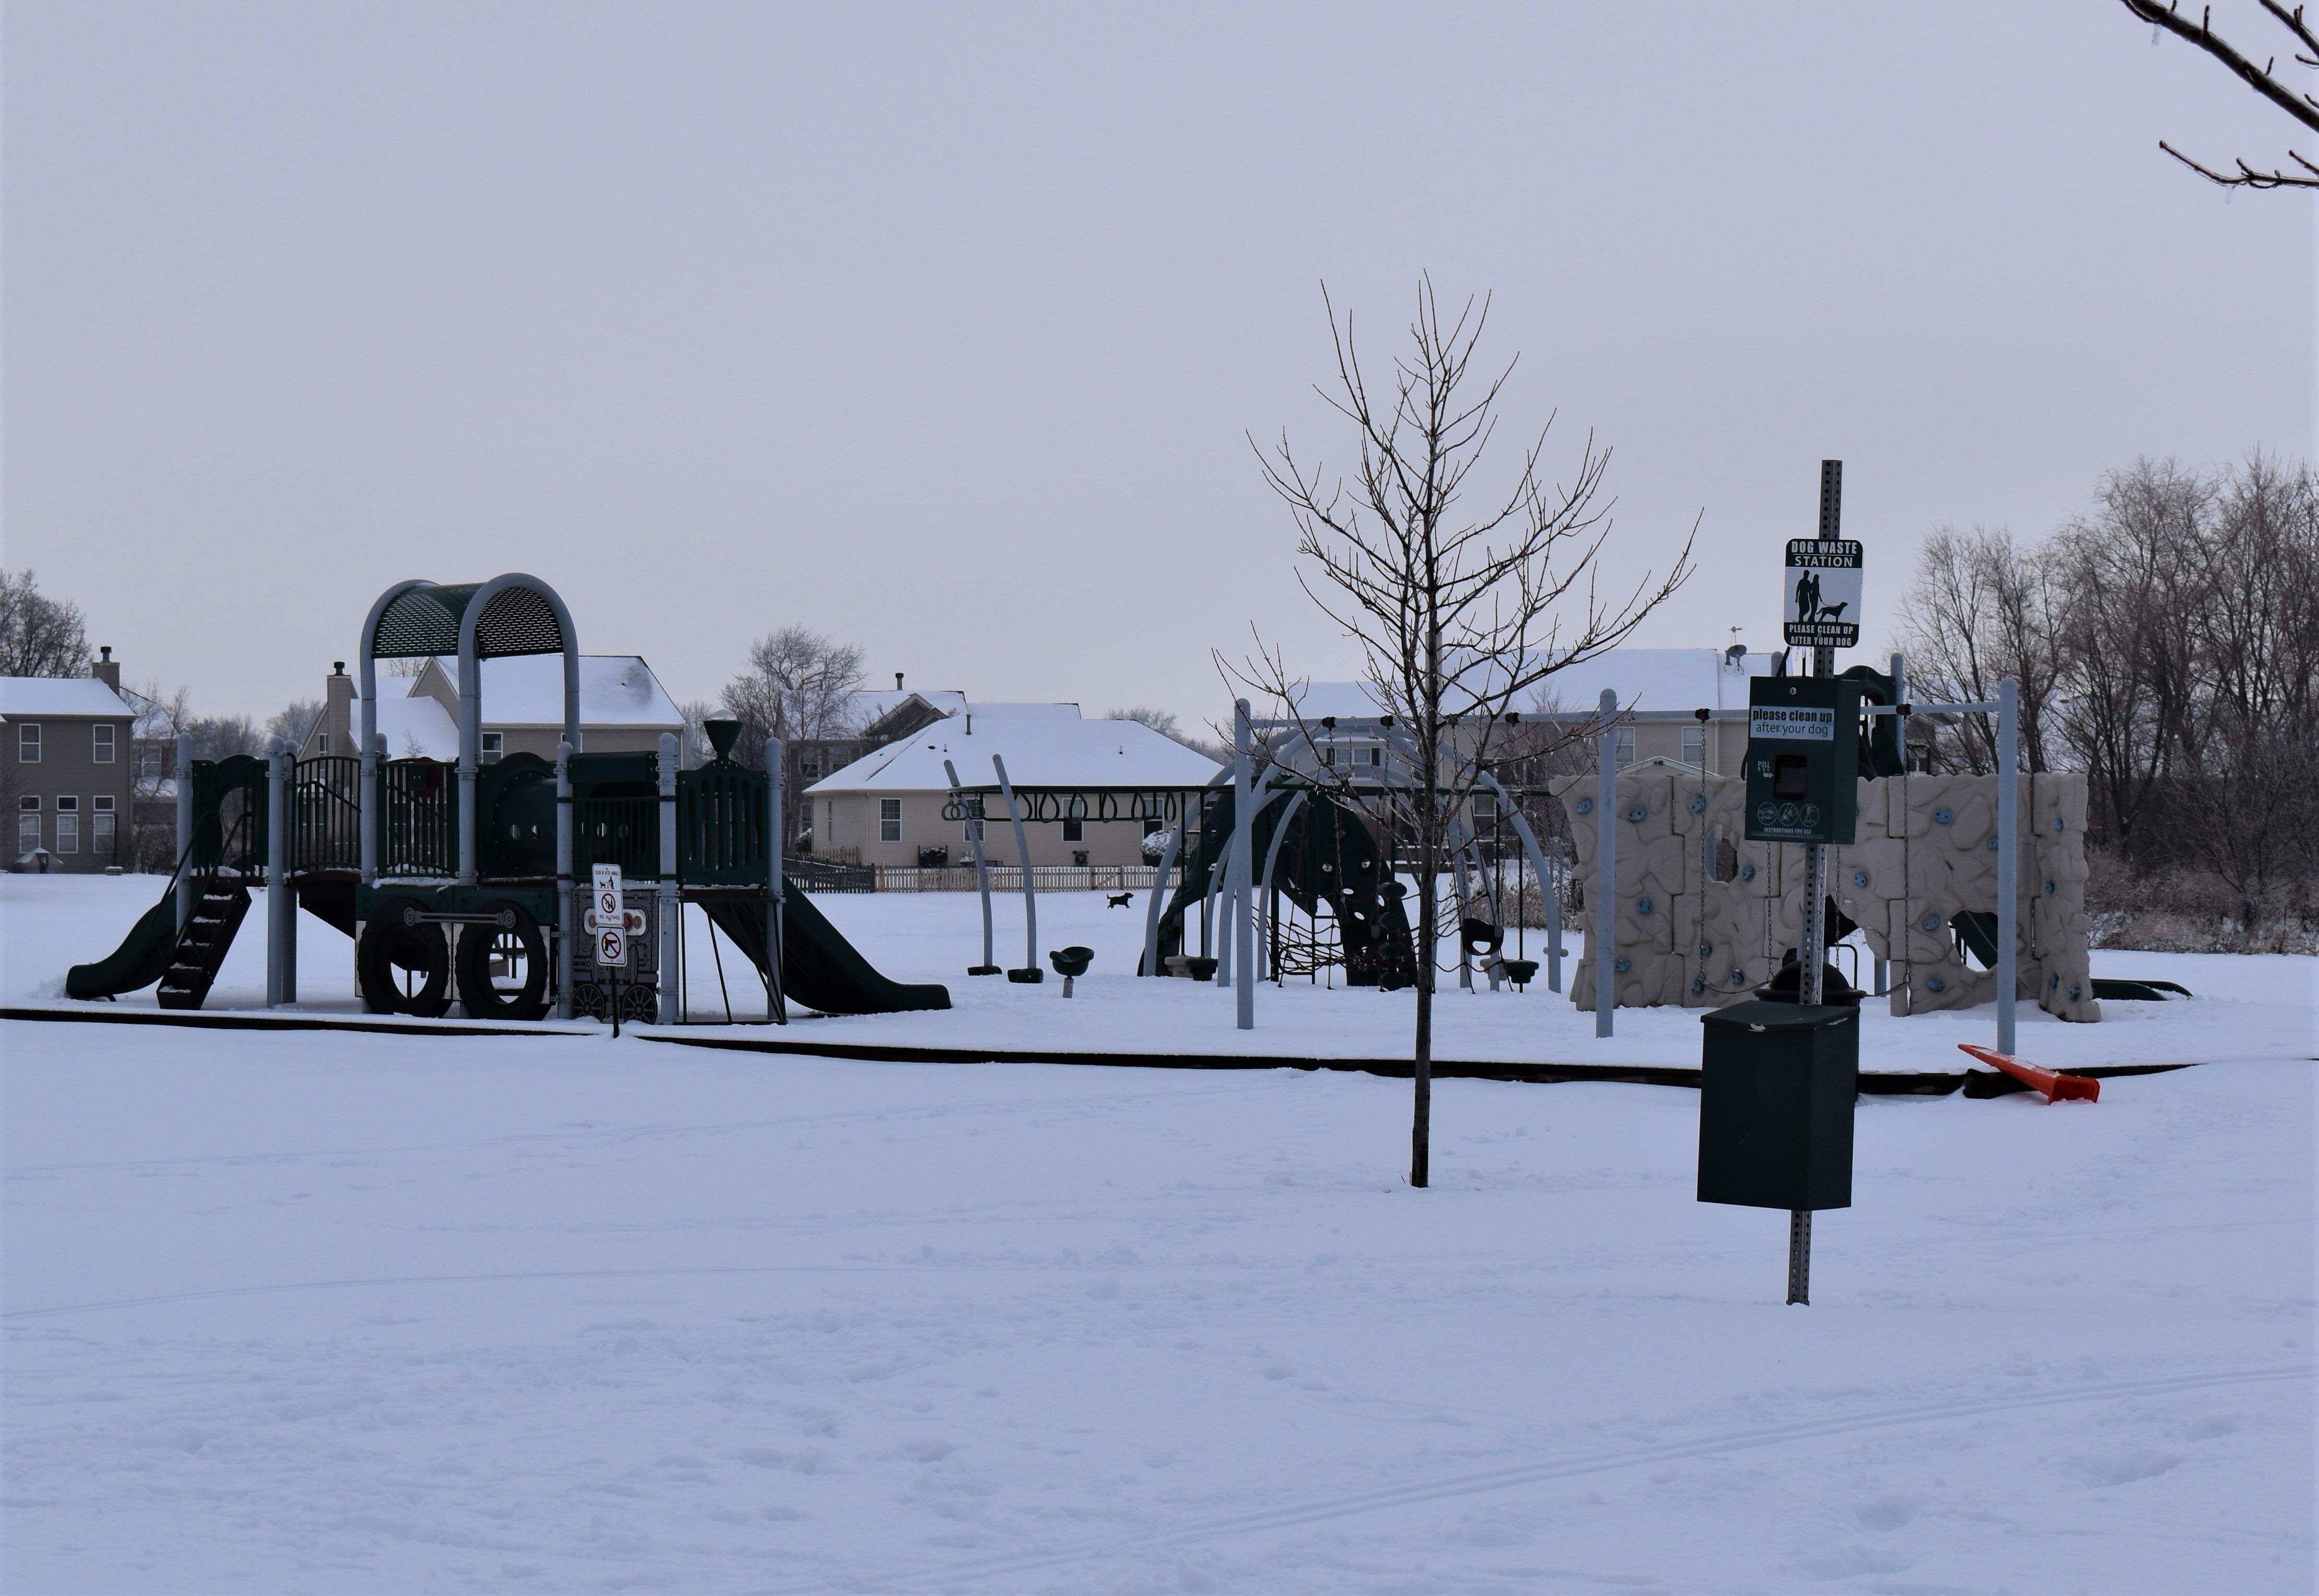 Sonatas Park